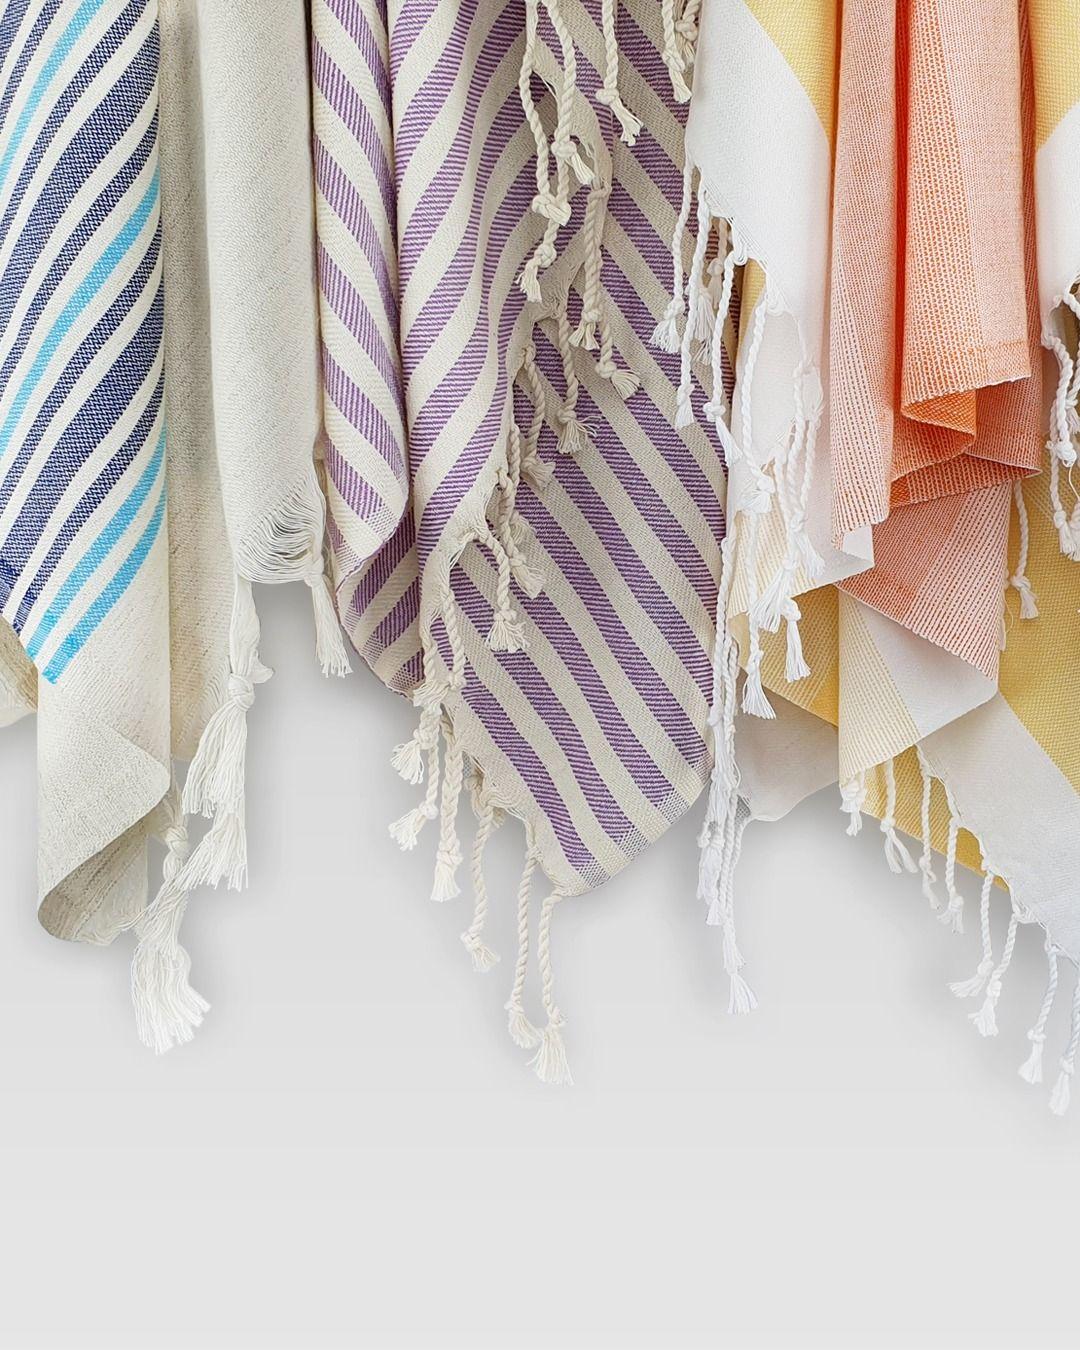 #colourful #stylish #versatile #beachtowel #hamamtowel #peshtemaltowel #foutatowel #scarf #madeinturkey #premiumcotton #unisex #gymtowel #yogatowel #traveltowel #peshtemall #peshtemallco